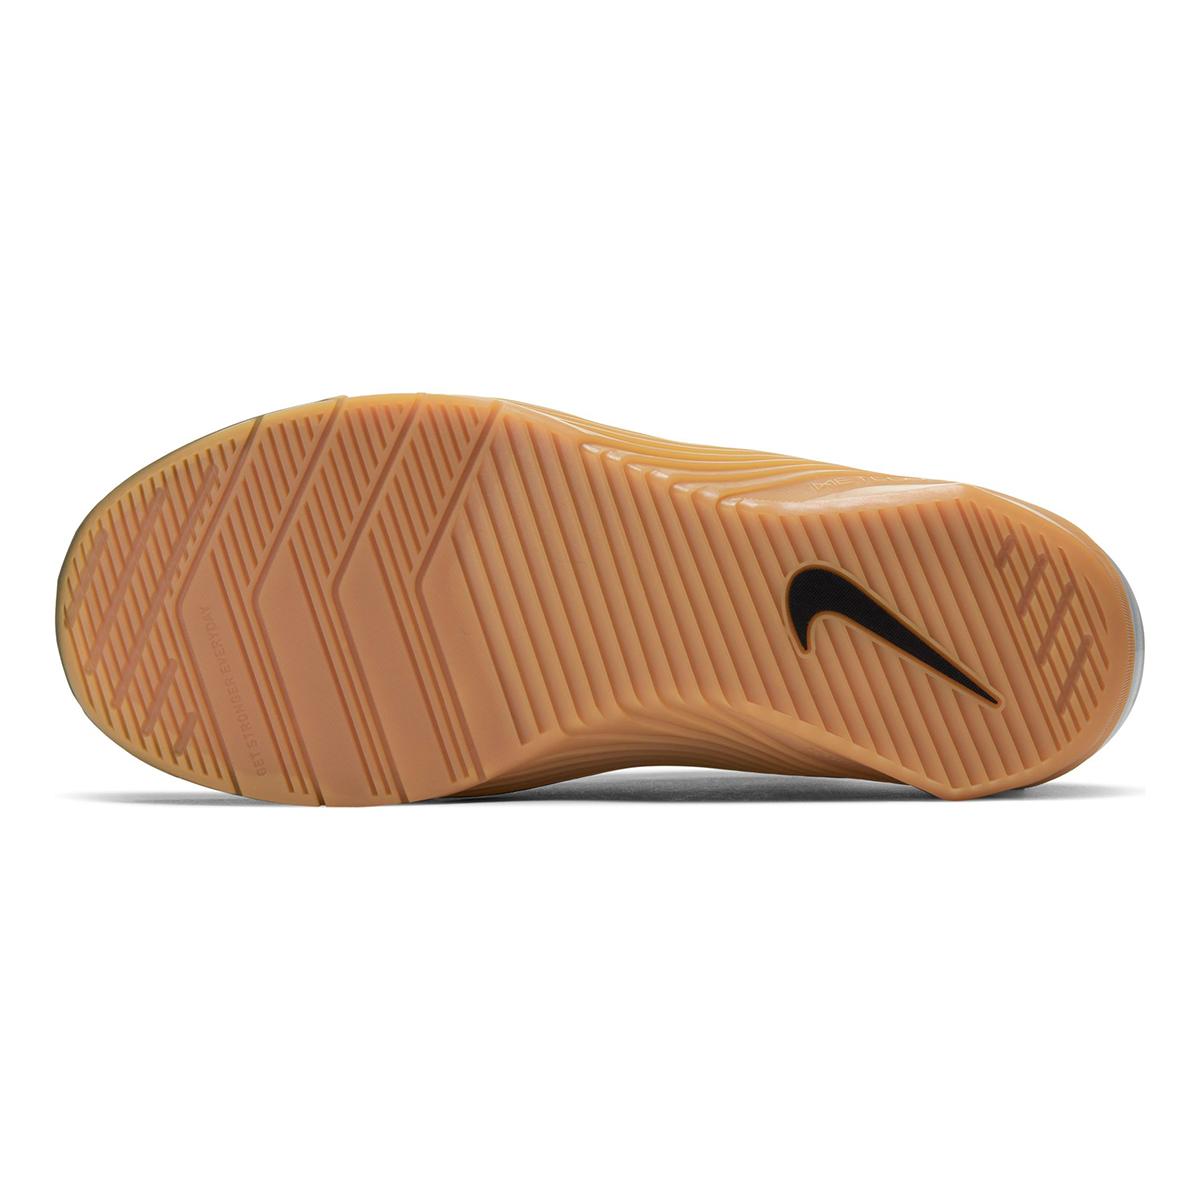 Men's Nike Metcon 5 Training Shoes  - Color: Black/White/Gum Med Brown - Size: 5 - Width: Regular, Black/White/Gum Med Brown, large, image 3